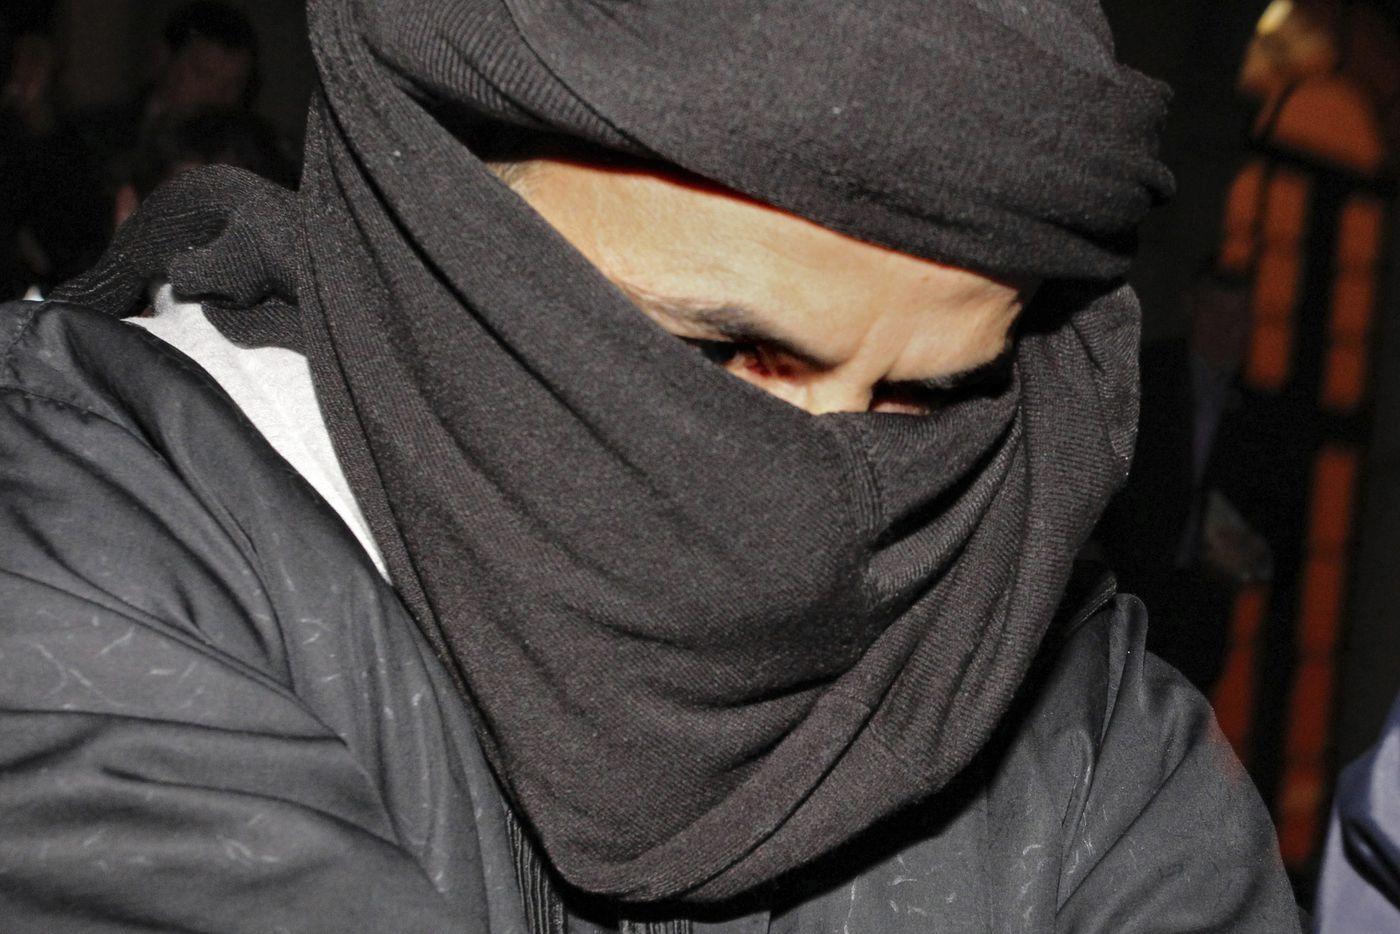 Al-Qaeda operative who recruited Montco's 'Jihad Jane' pleads guilty, agrees to 15 years in prison